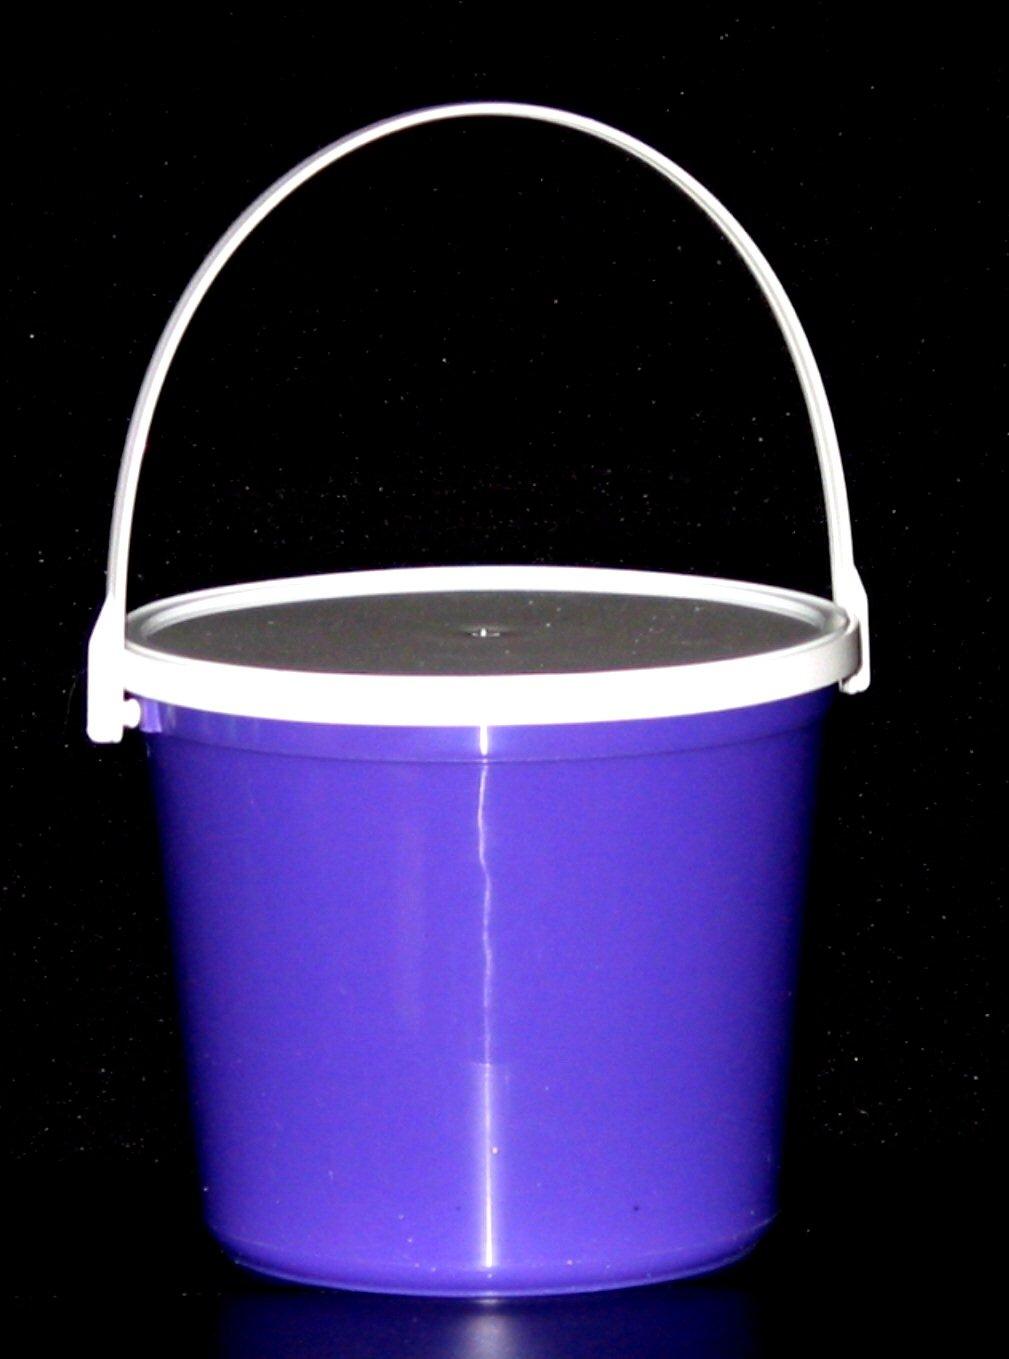 Plastic Buckets & Lids, 80 Ounces, 6 Pack,1 each Red Blue Yellow Orange Purple & Green by Talisman (Image #3)